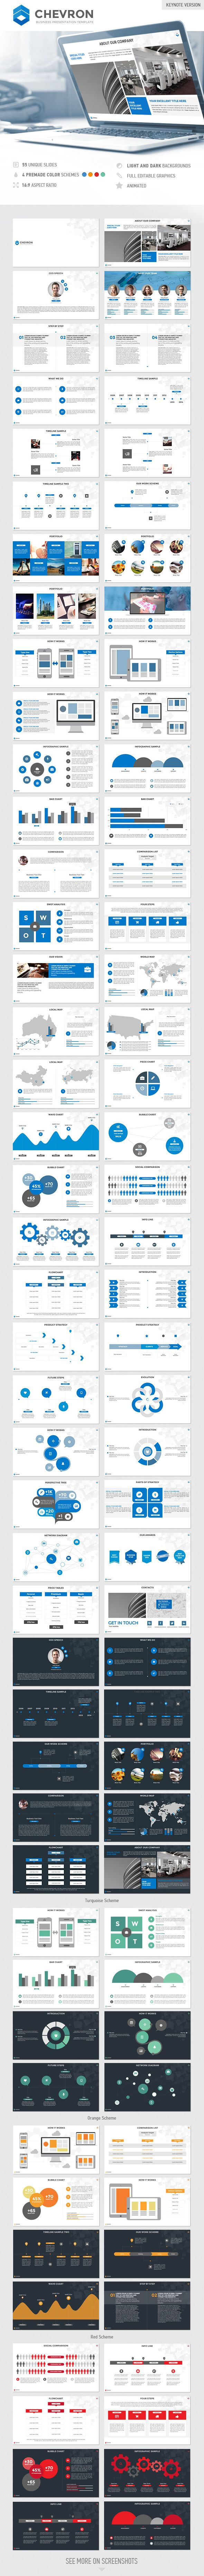 Chevron Keynote Presentation Template - Business Keynote Templates